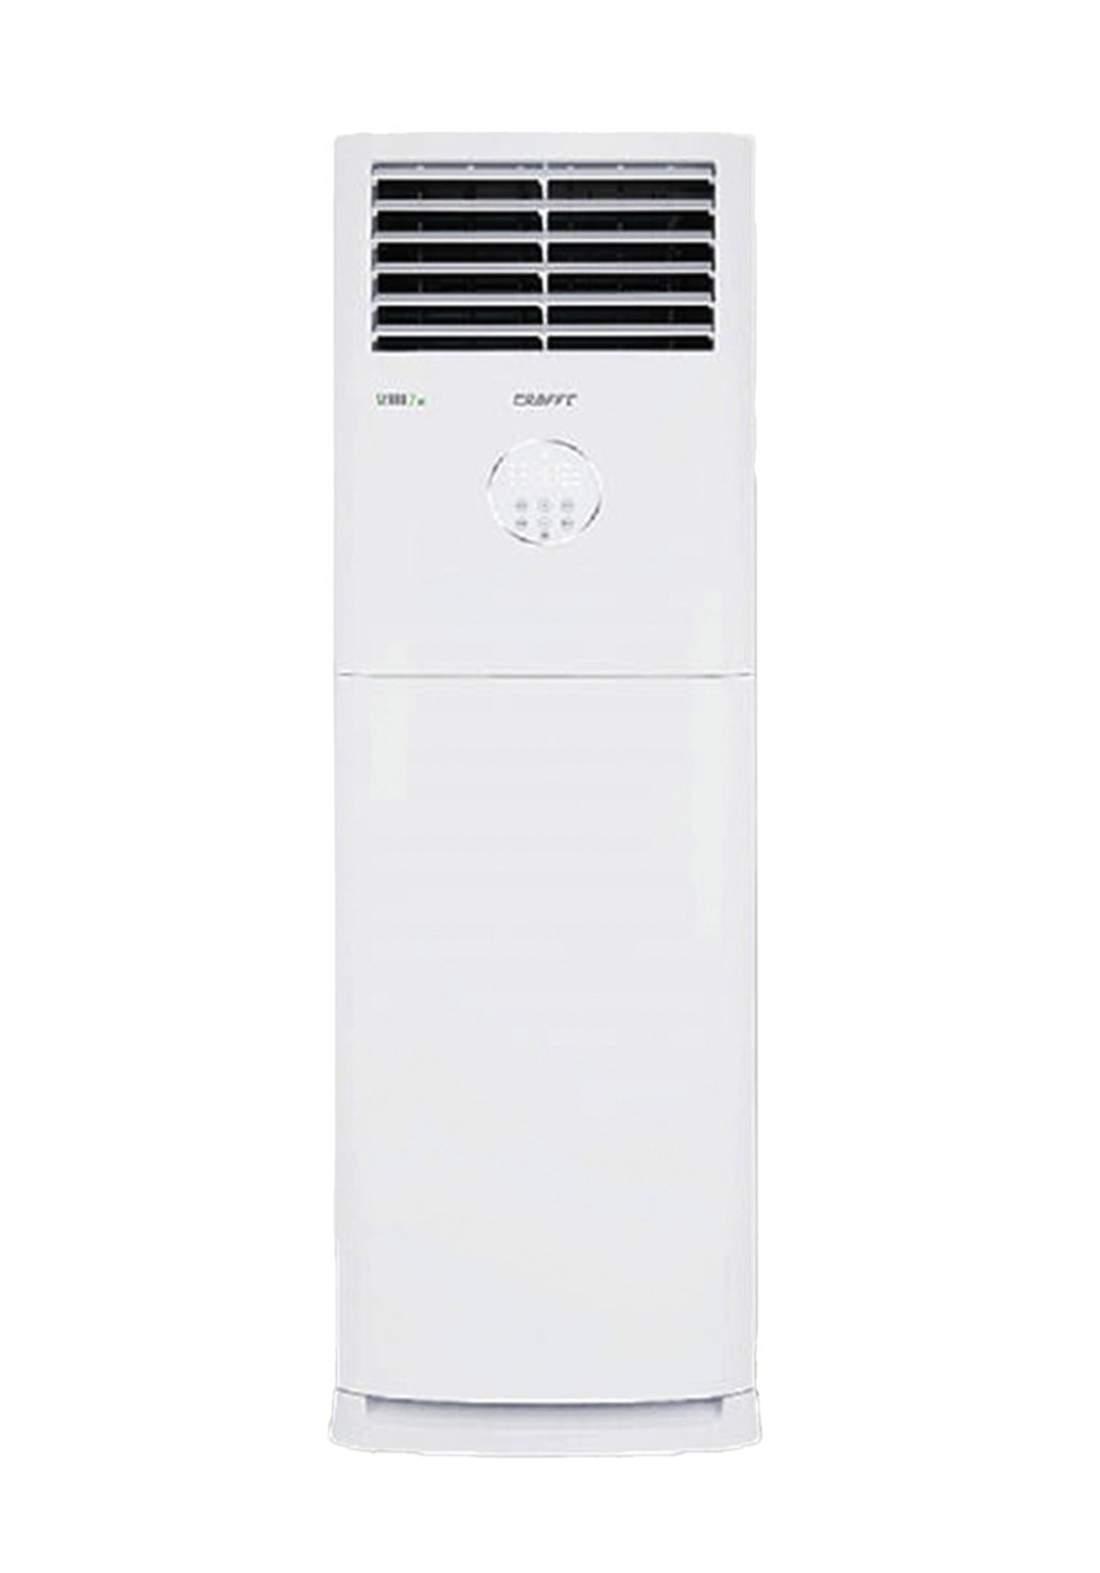 سبلت عامودي 4 طن حار بارد سيرا2 غاز  Crafft R410